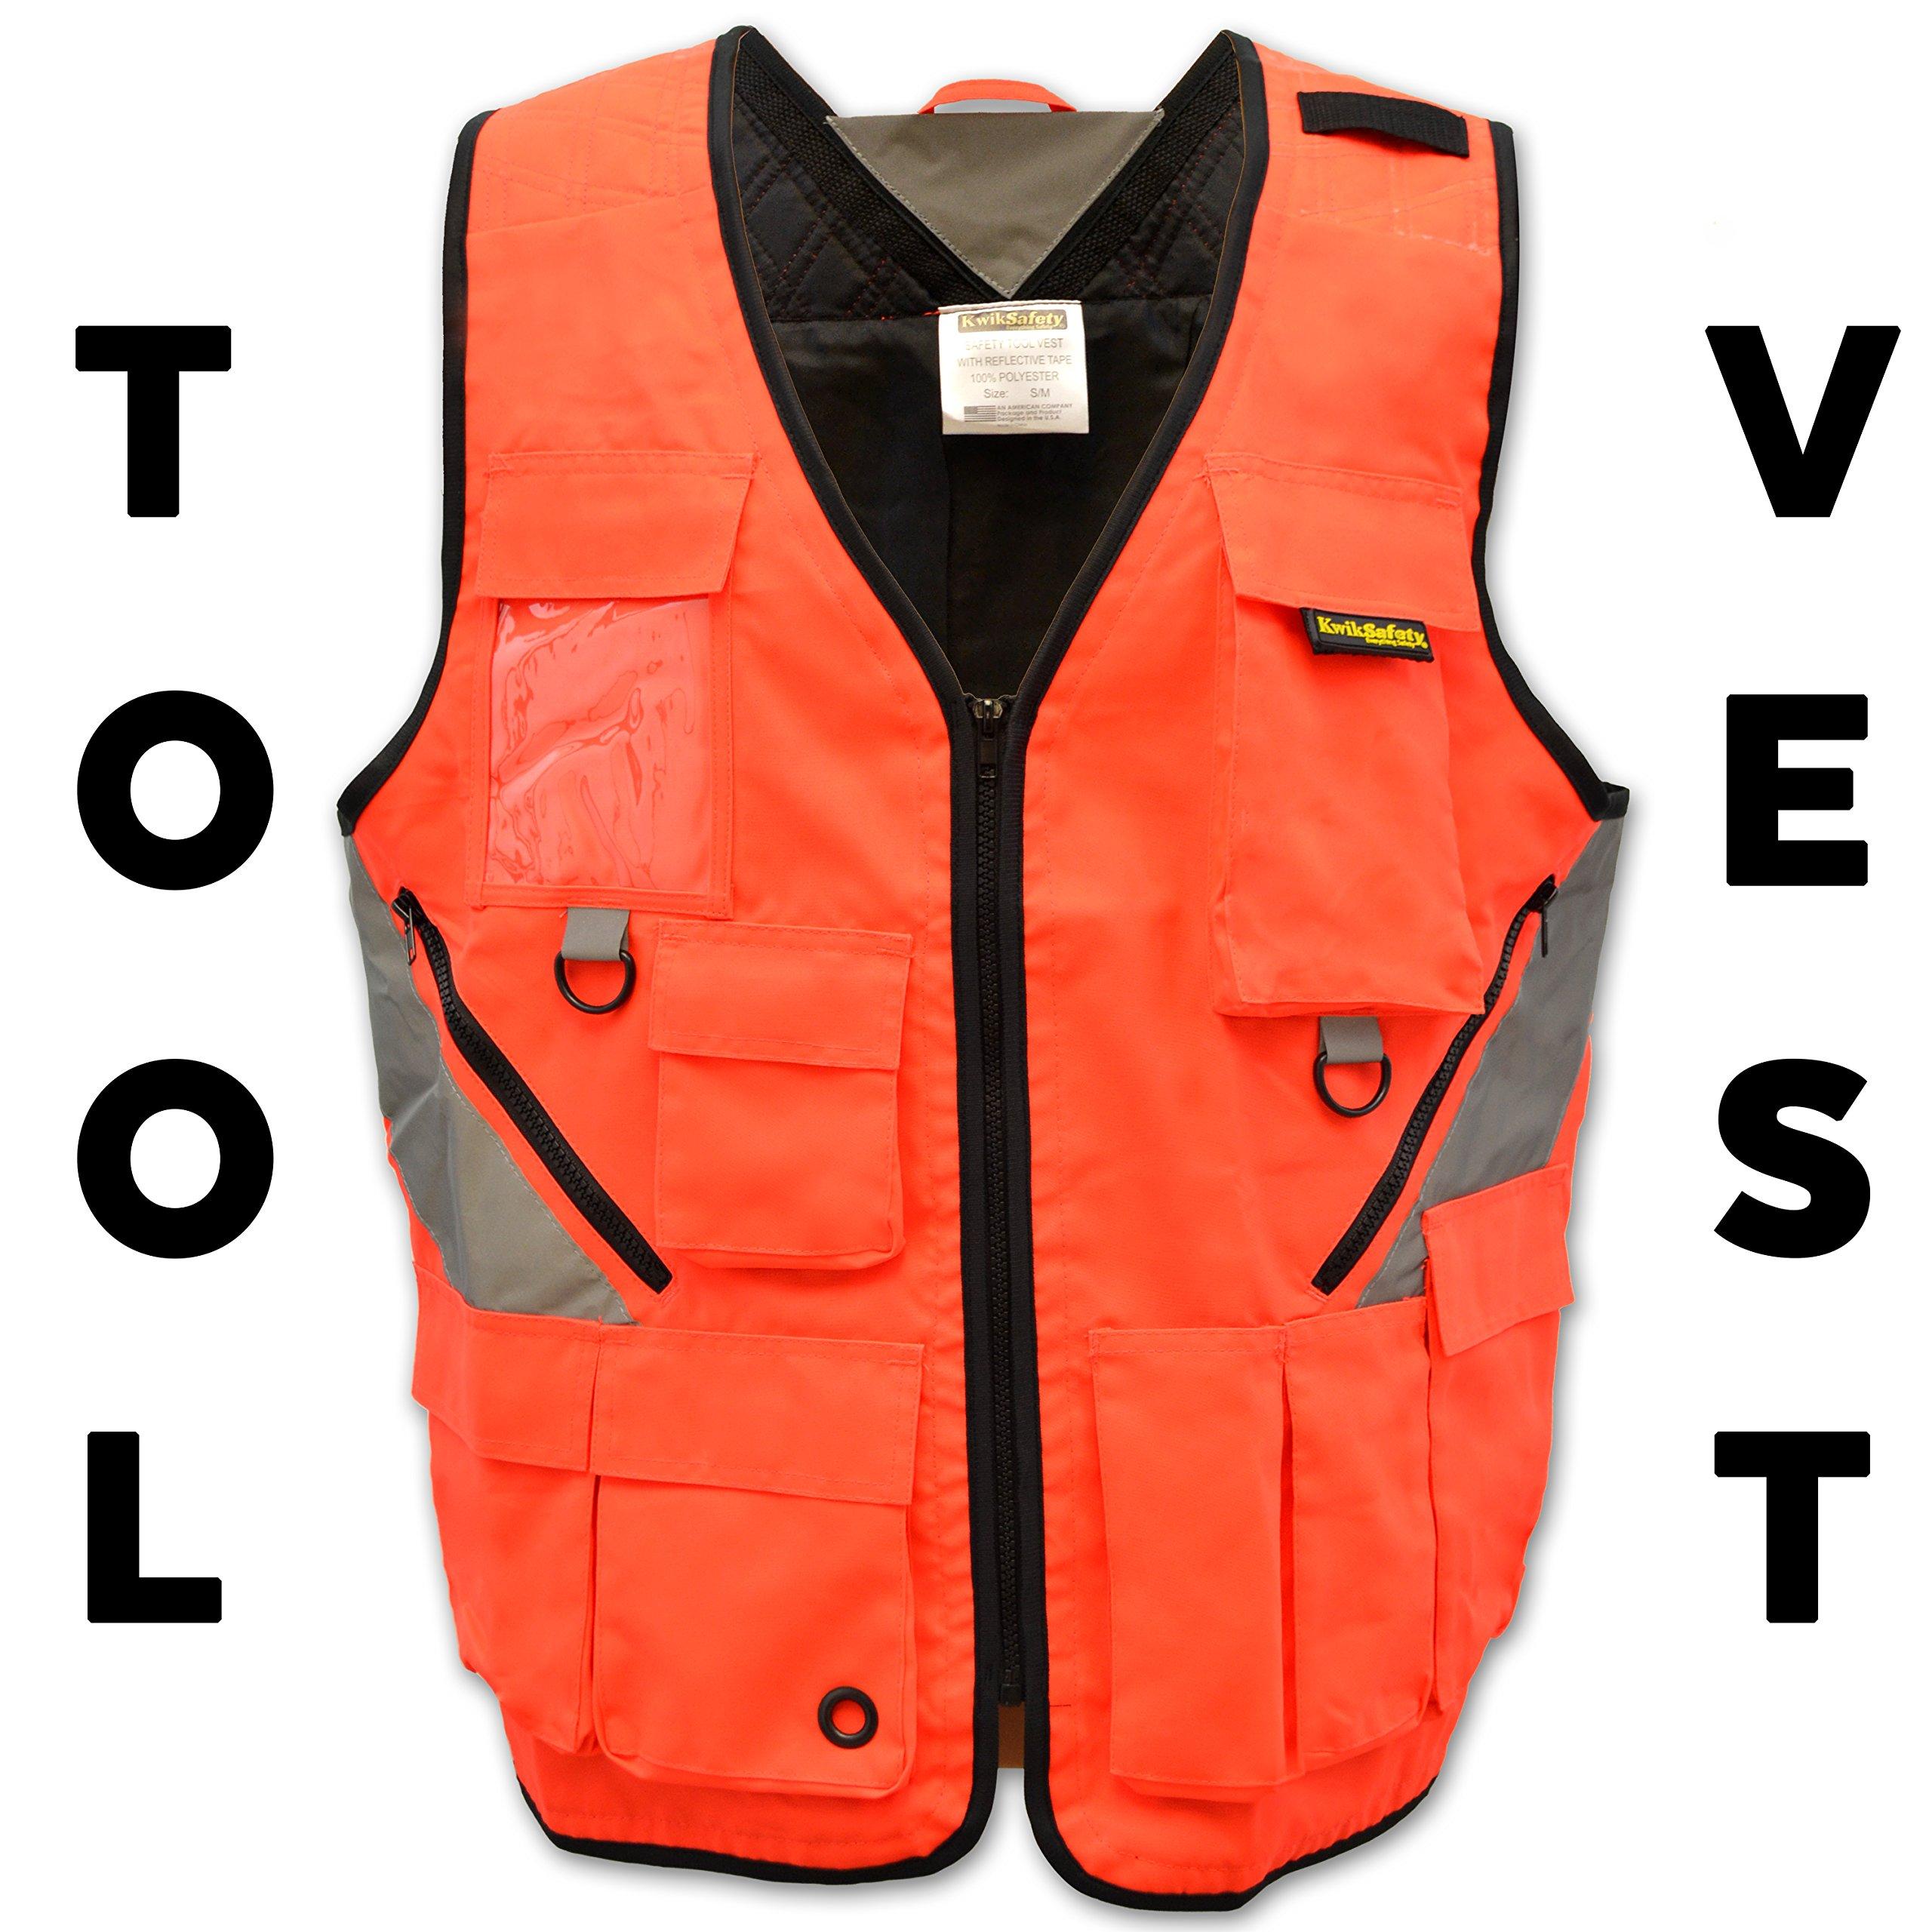 KwikSafety (Charlotte, NC) ARTISAN Tool Vest | Reflective Multi Pocket Lightweight Work Wear | Hi Vis Volunteer Emergency Crew Surveyor Carpenter Electrician Engineer | Men Women Regular | 4XL/5XL by KwikSafety (Image #2)